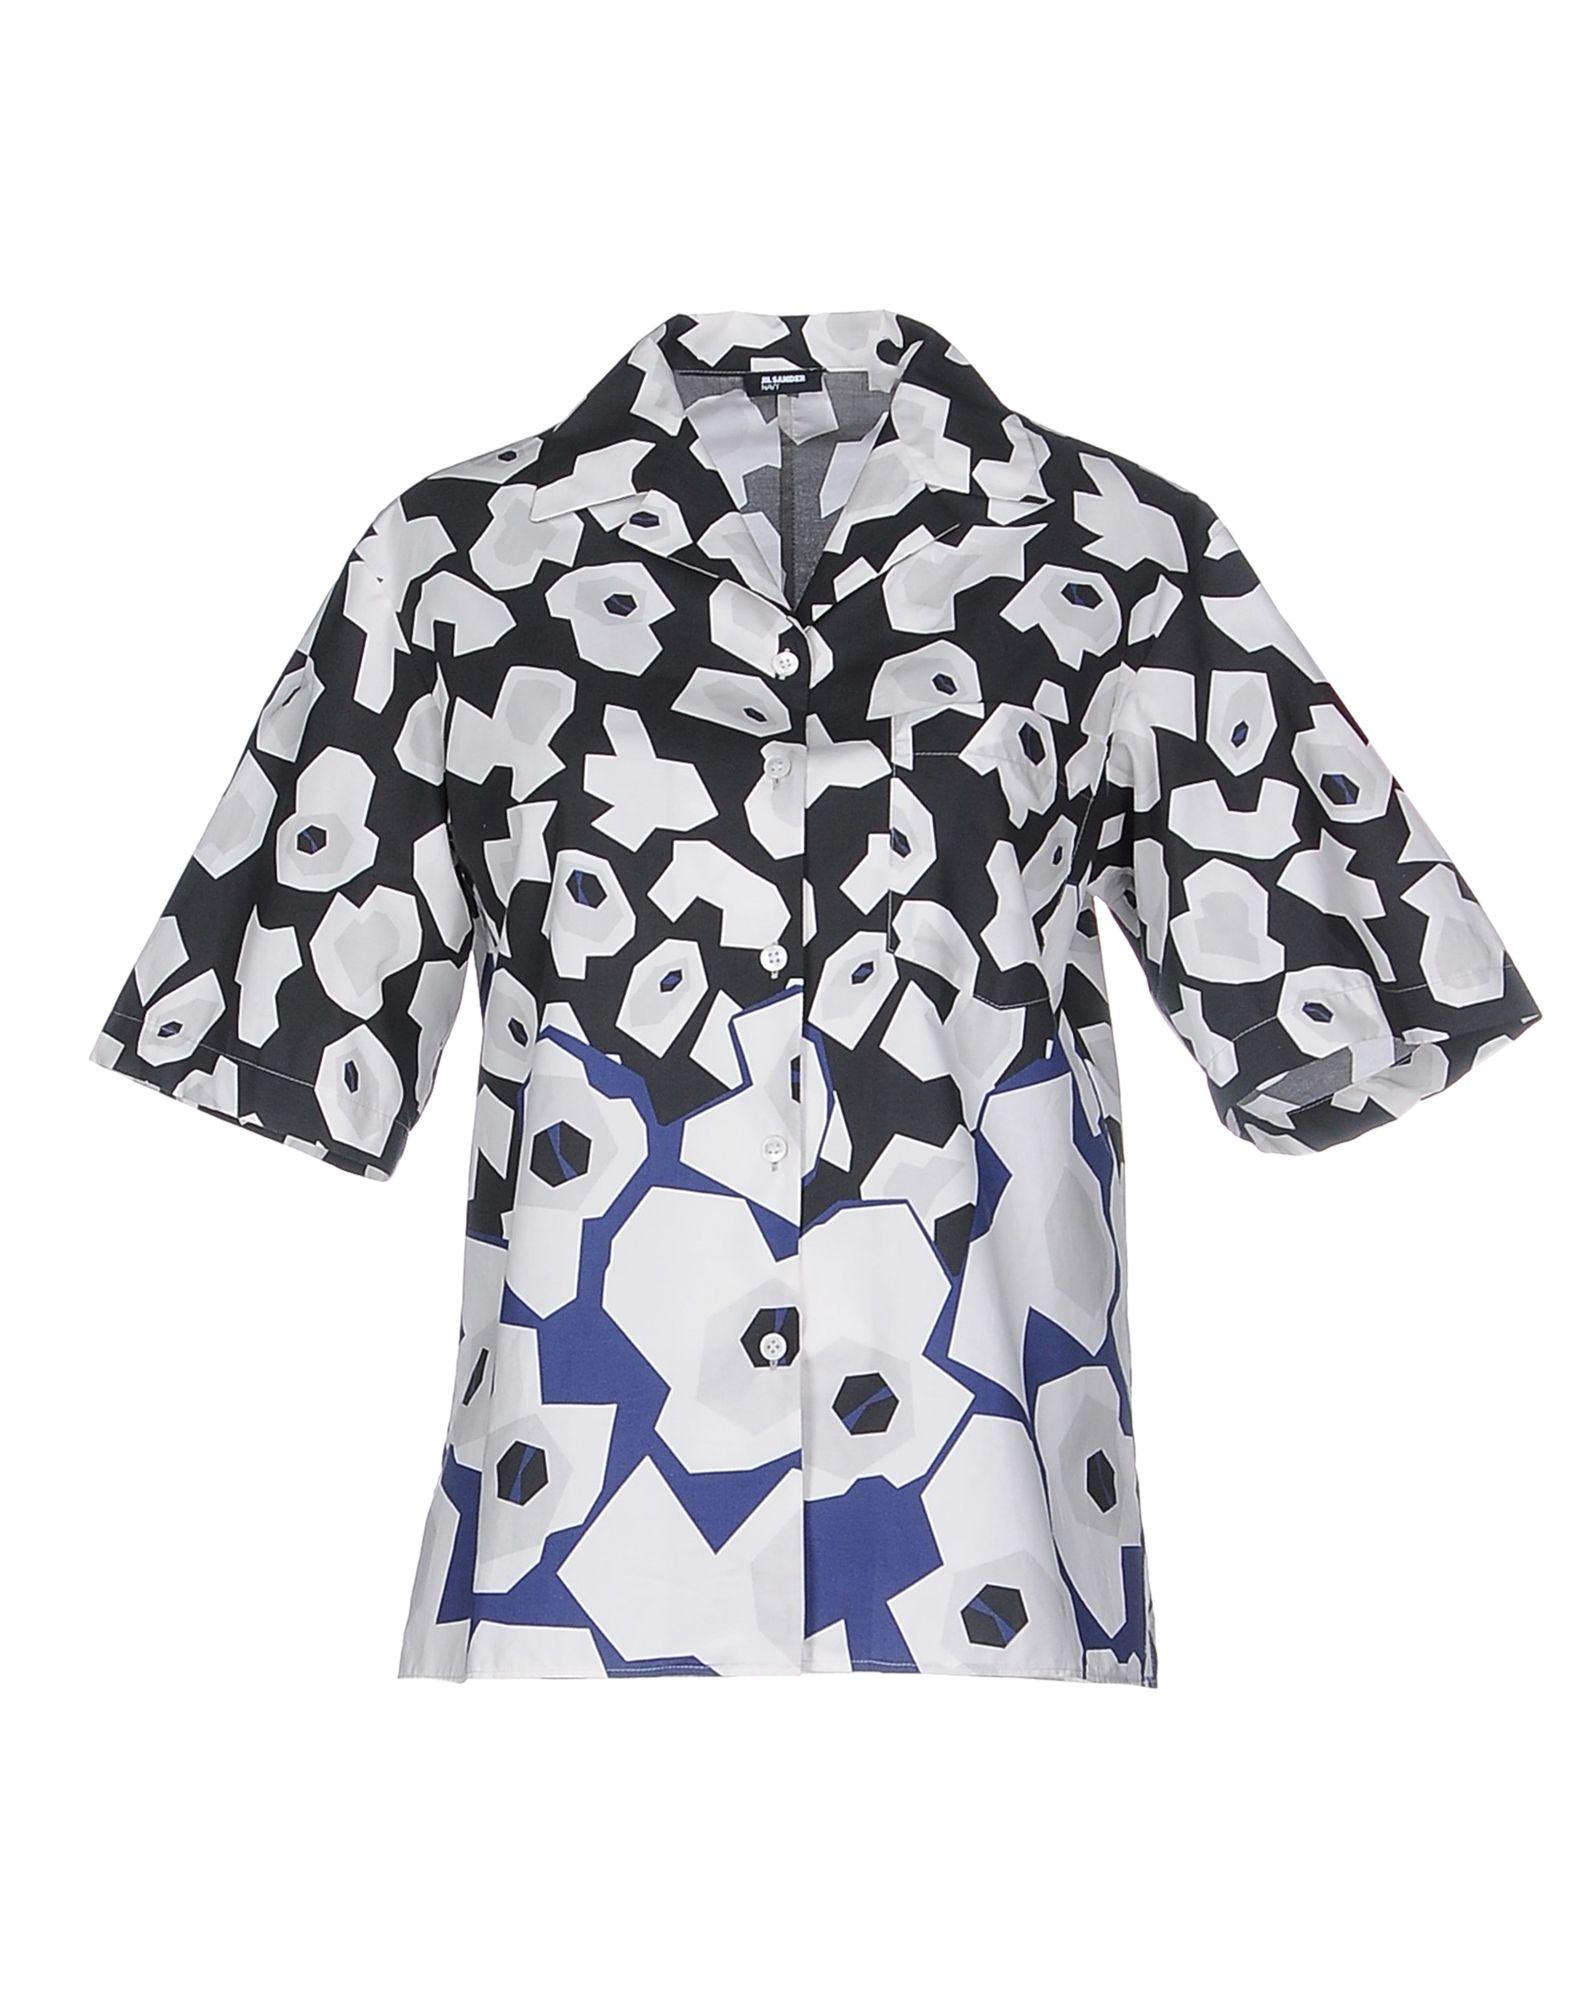 Camicie  E bluse Fantasia Jil Sander Navy Navy donna - 38485099IH